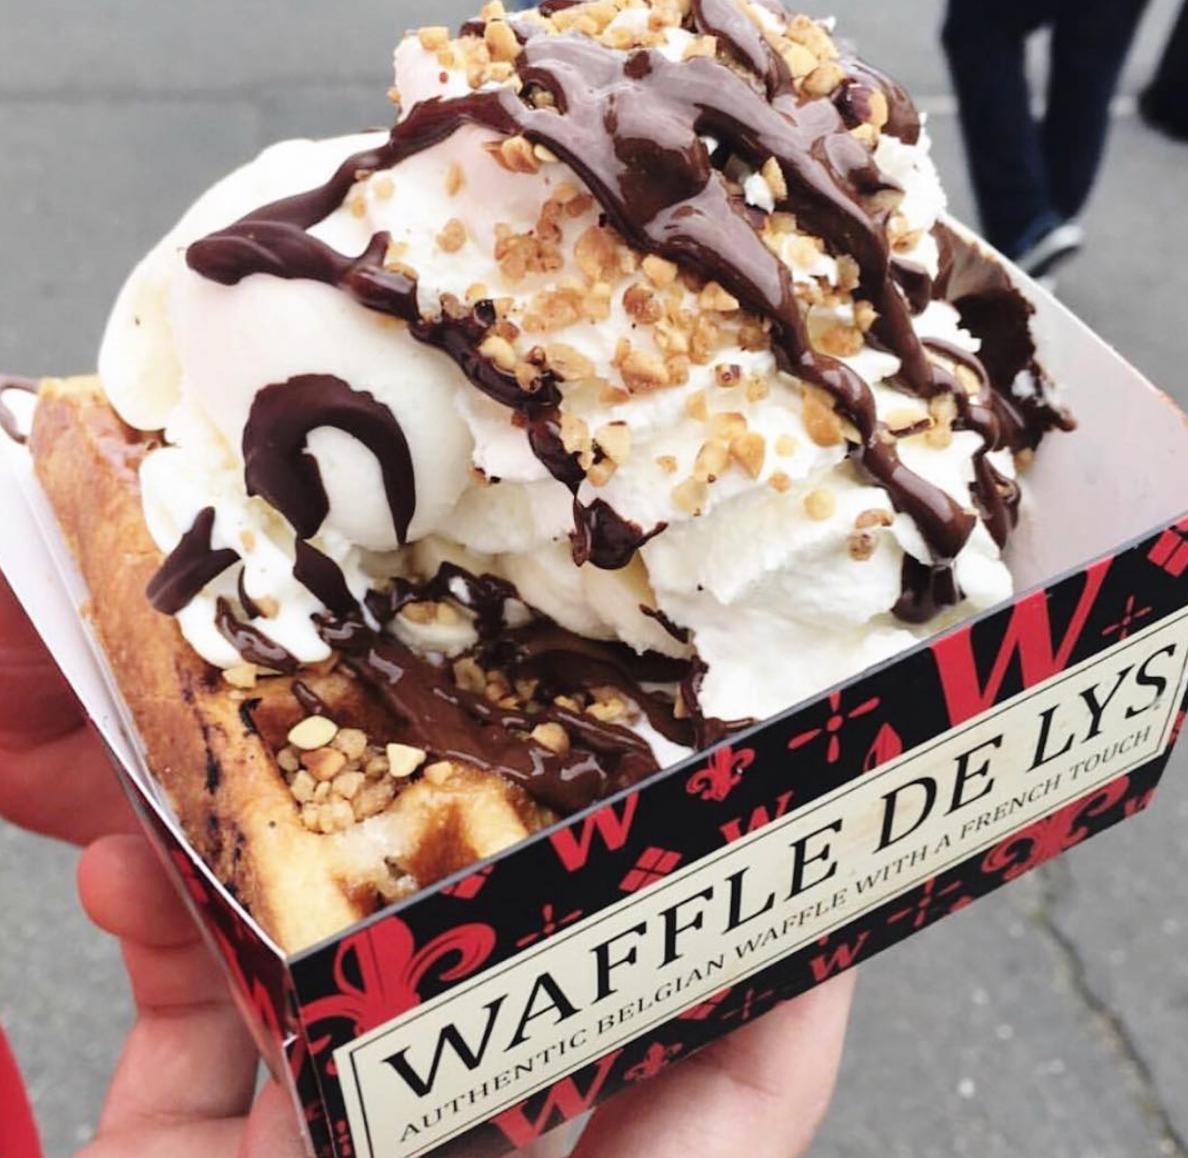 Waffle de Lys Belgian Waffle